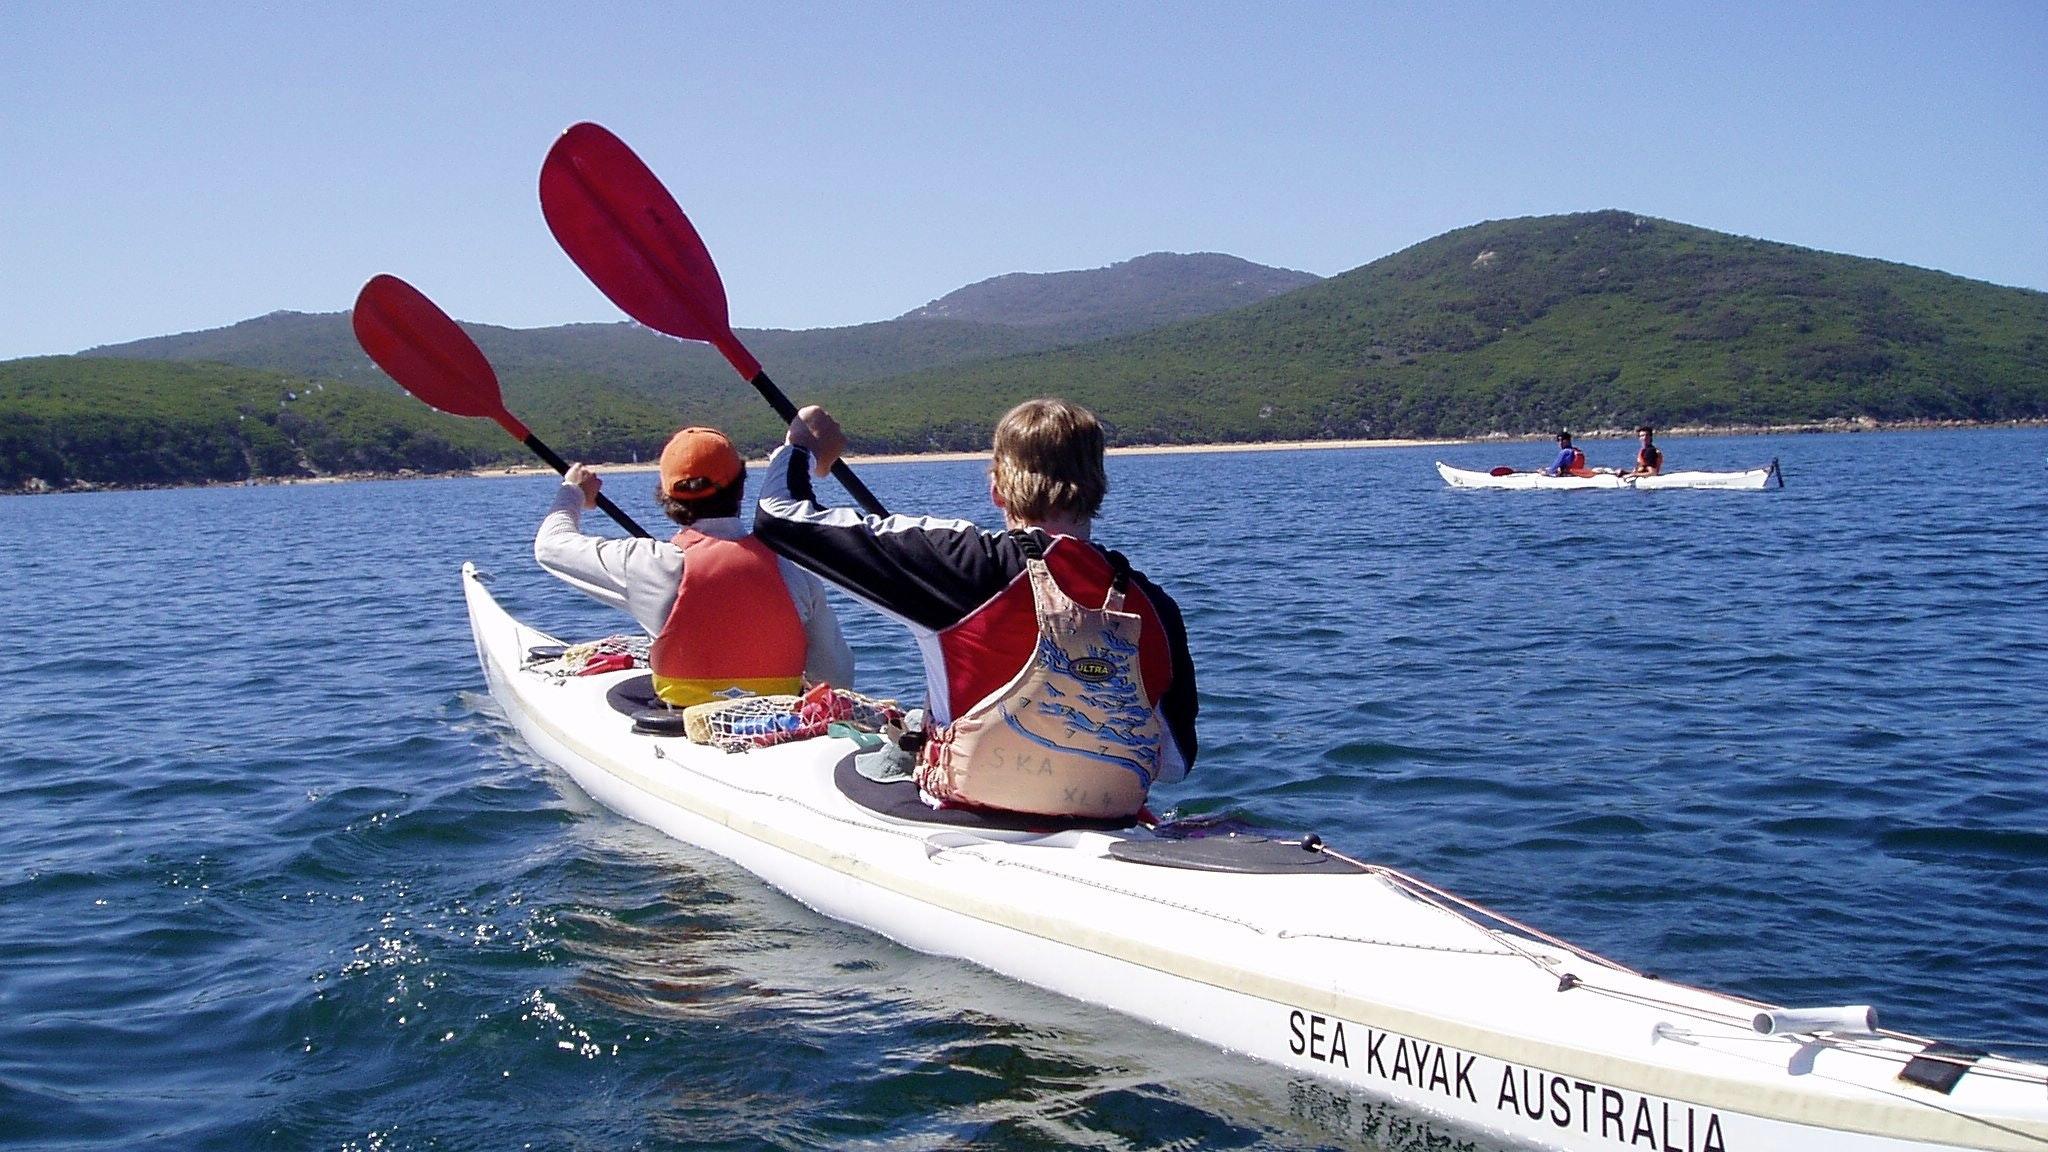 East Coast Wilsons Promontory Sea Kayak Tour